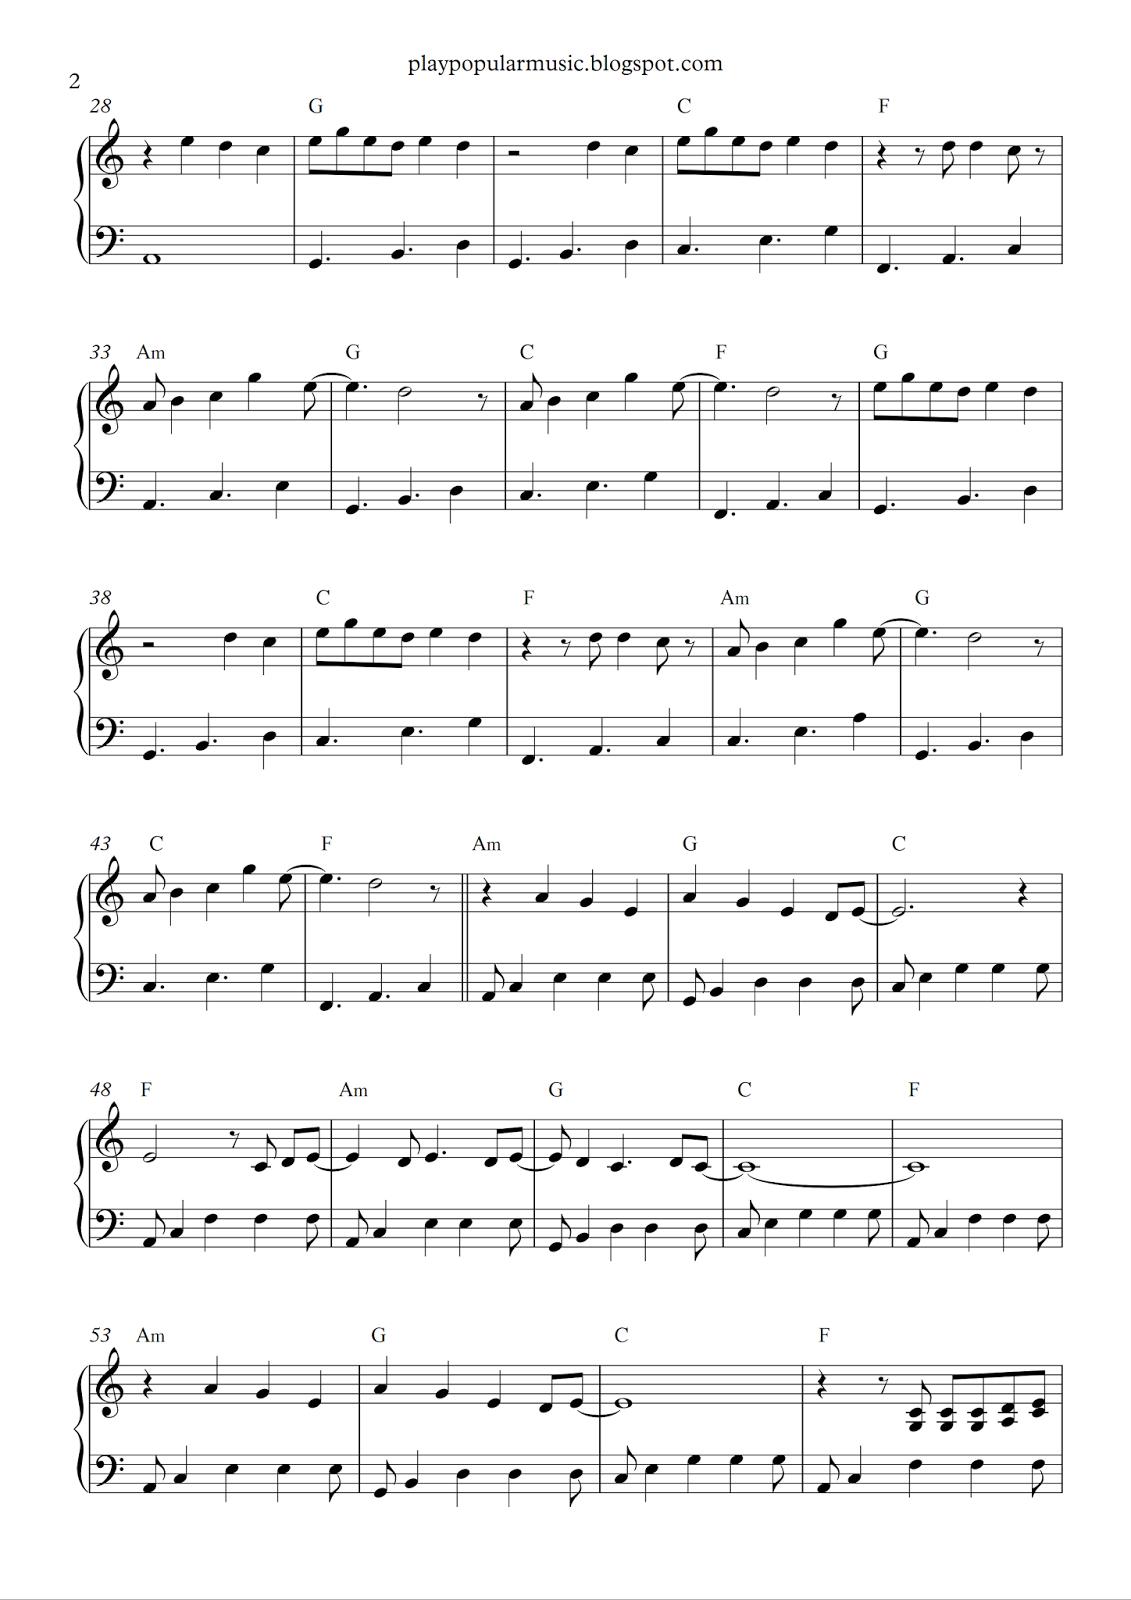 Free Piano Sheet Music: Shawn Mendes - Stitches.pdf N Ow That I'm - Airplanes Piano Sheet Music Free Printable